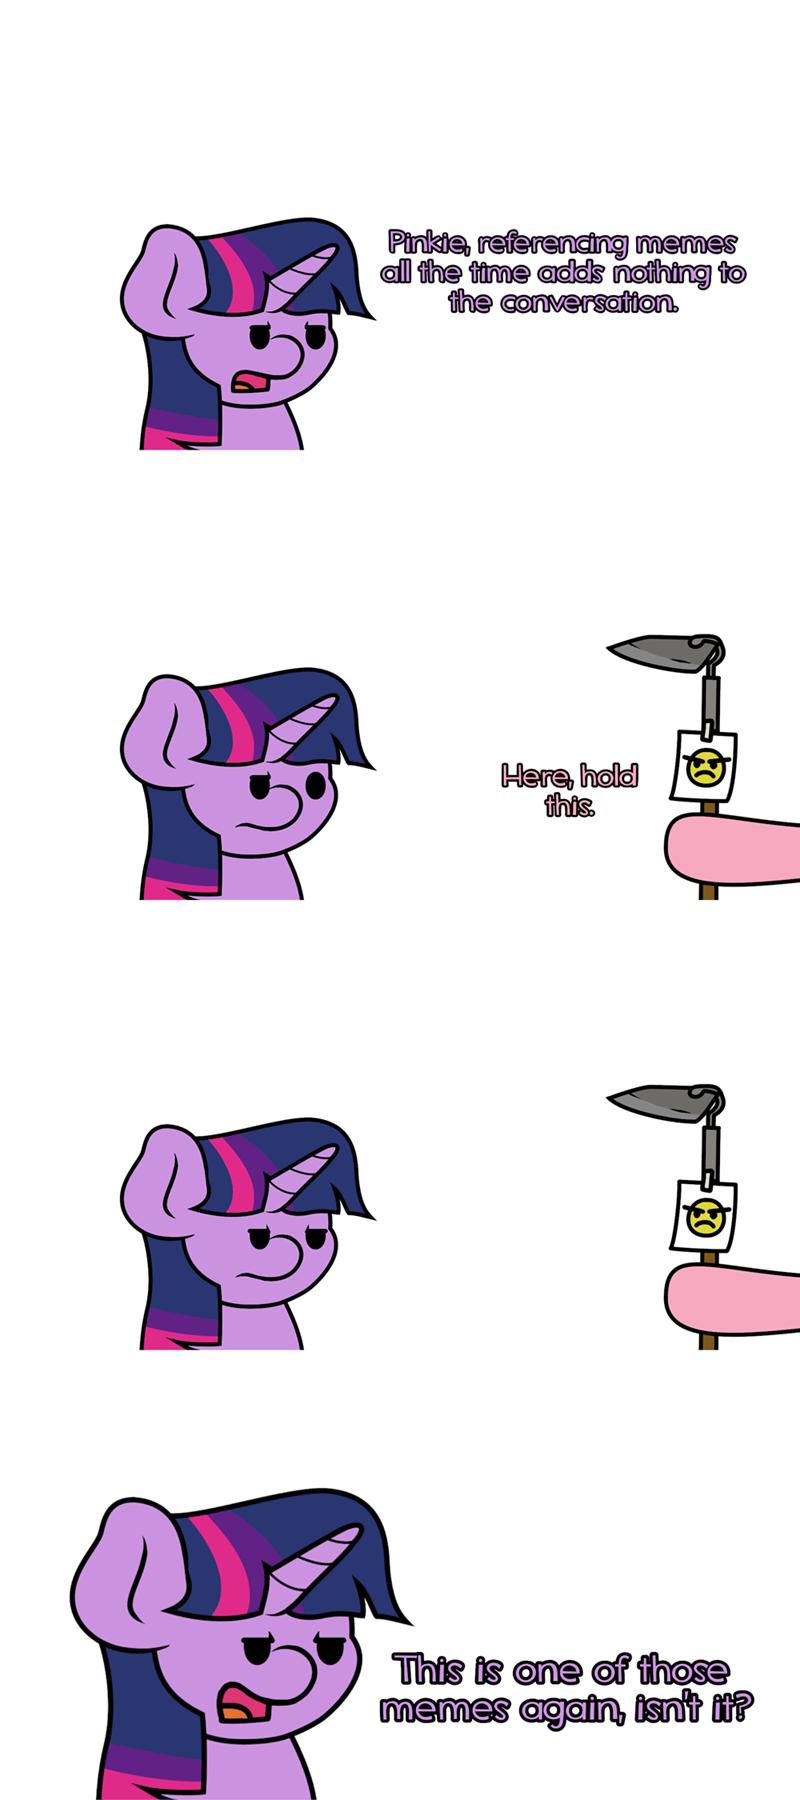 twilight sparkle jandamz puns pinkie pie Memes - 9320037632